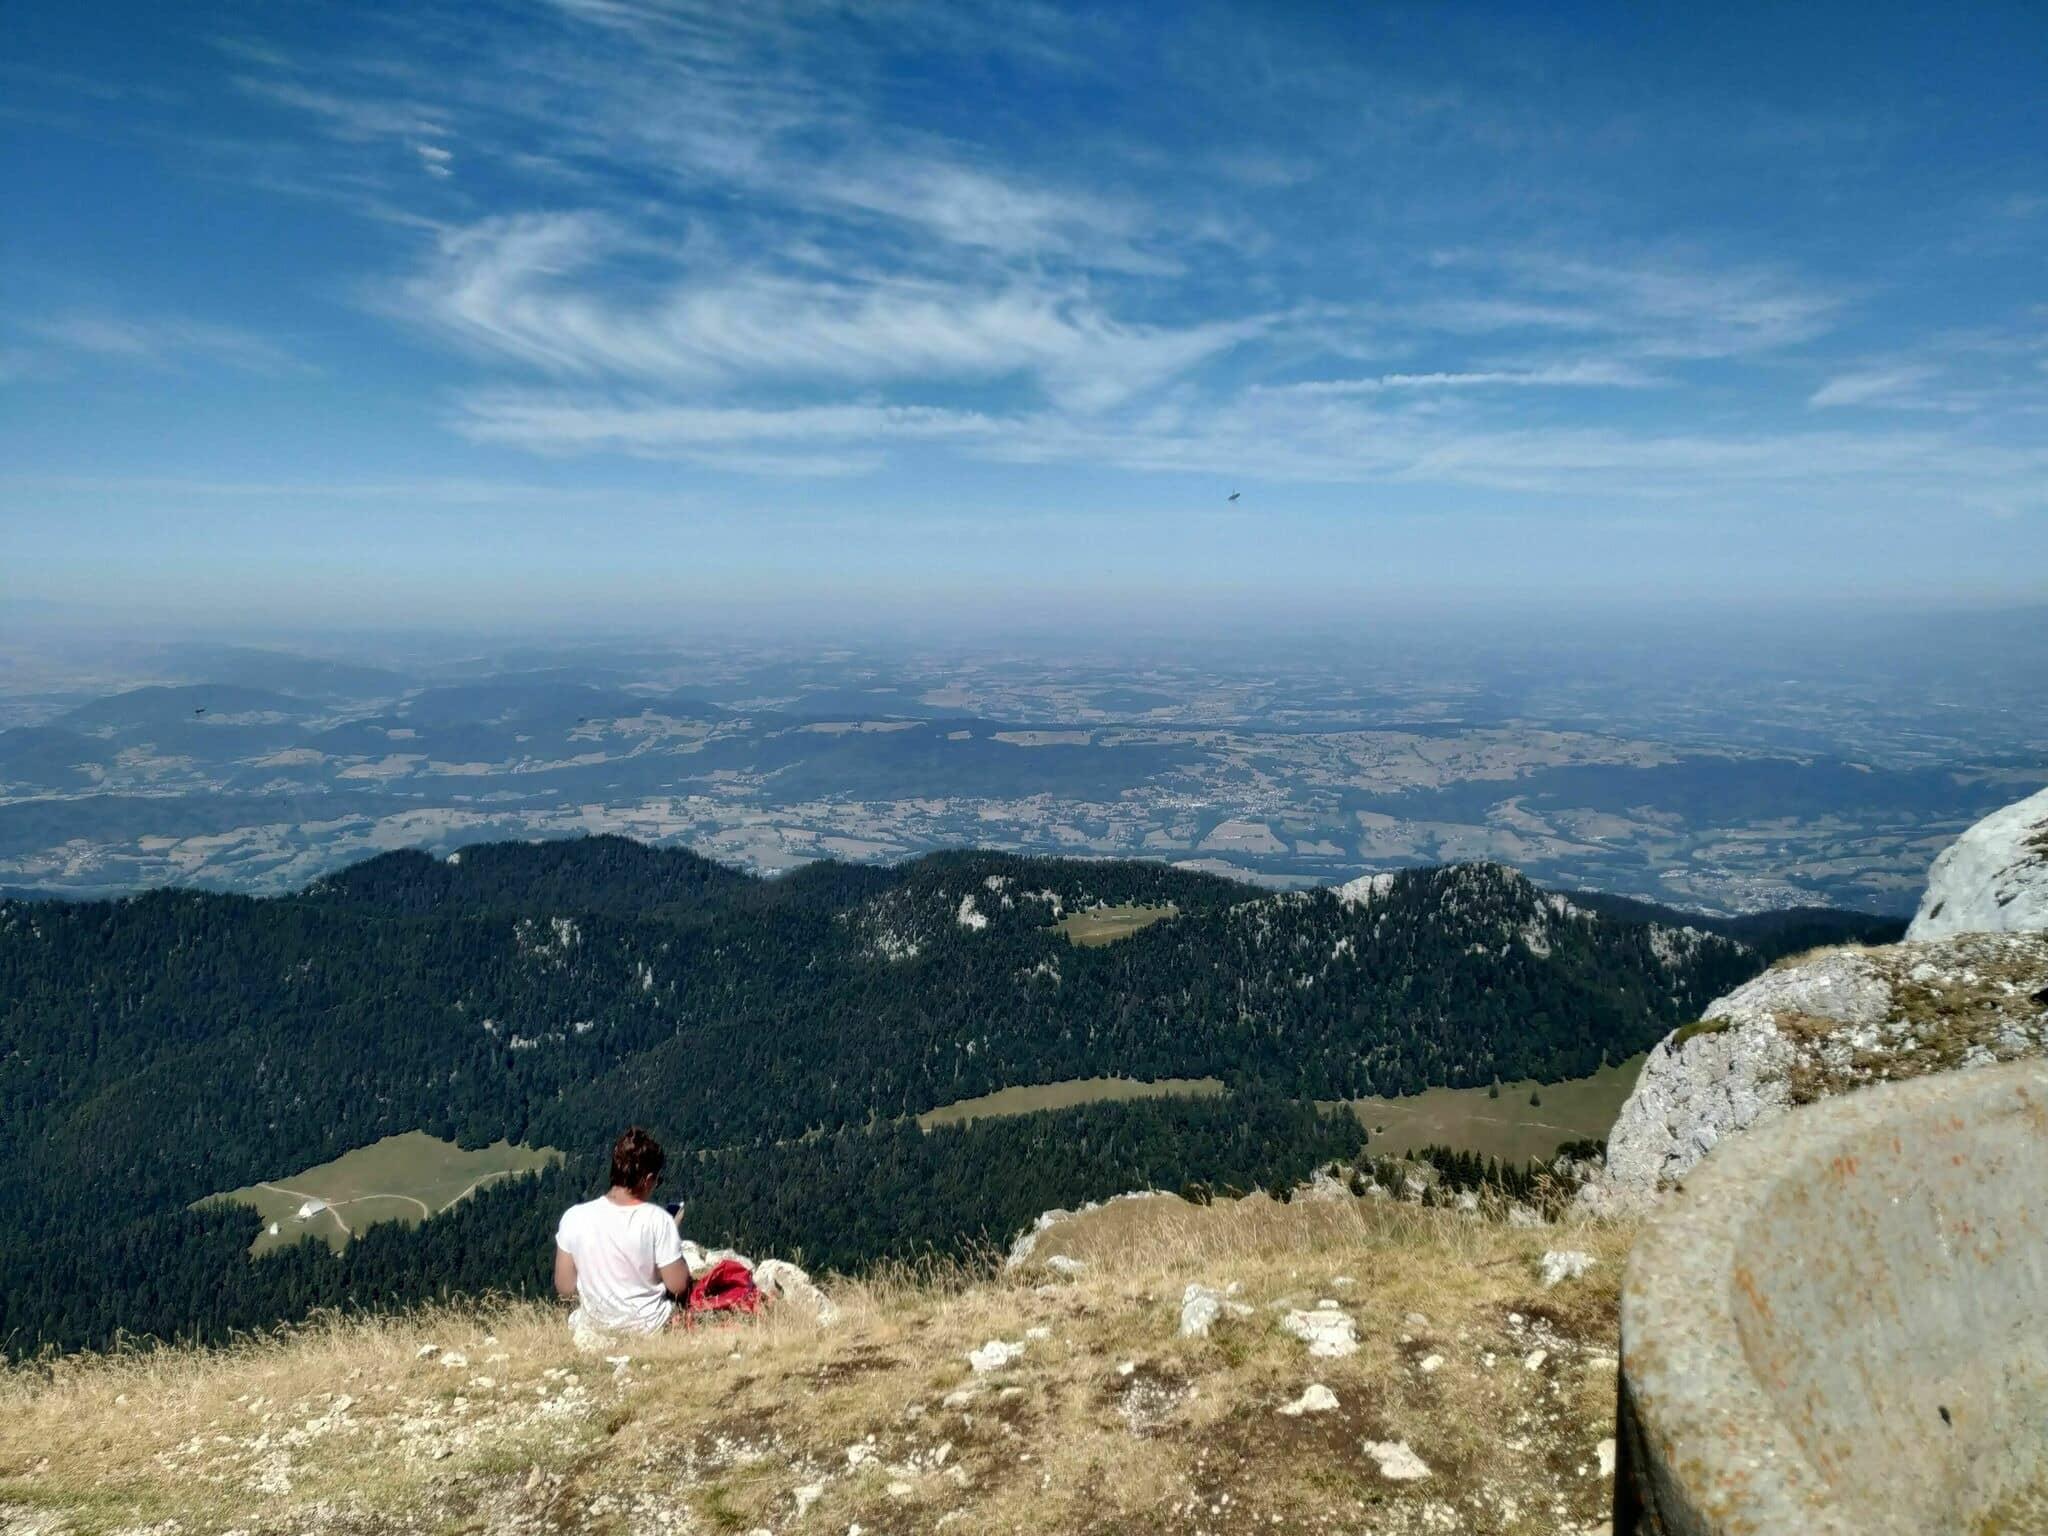 Randonnée Grenoble : Le Grand Som et la Grande Chartreuse